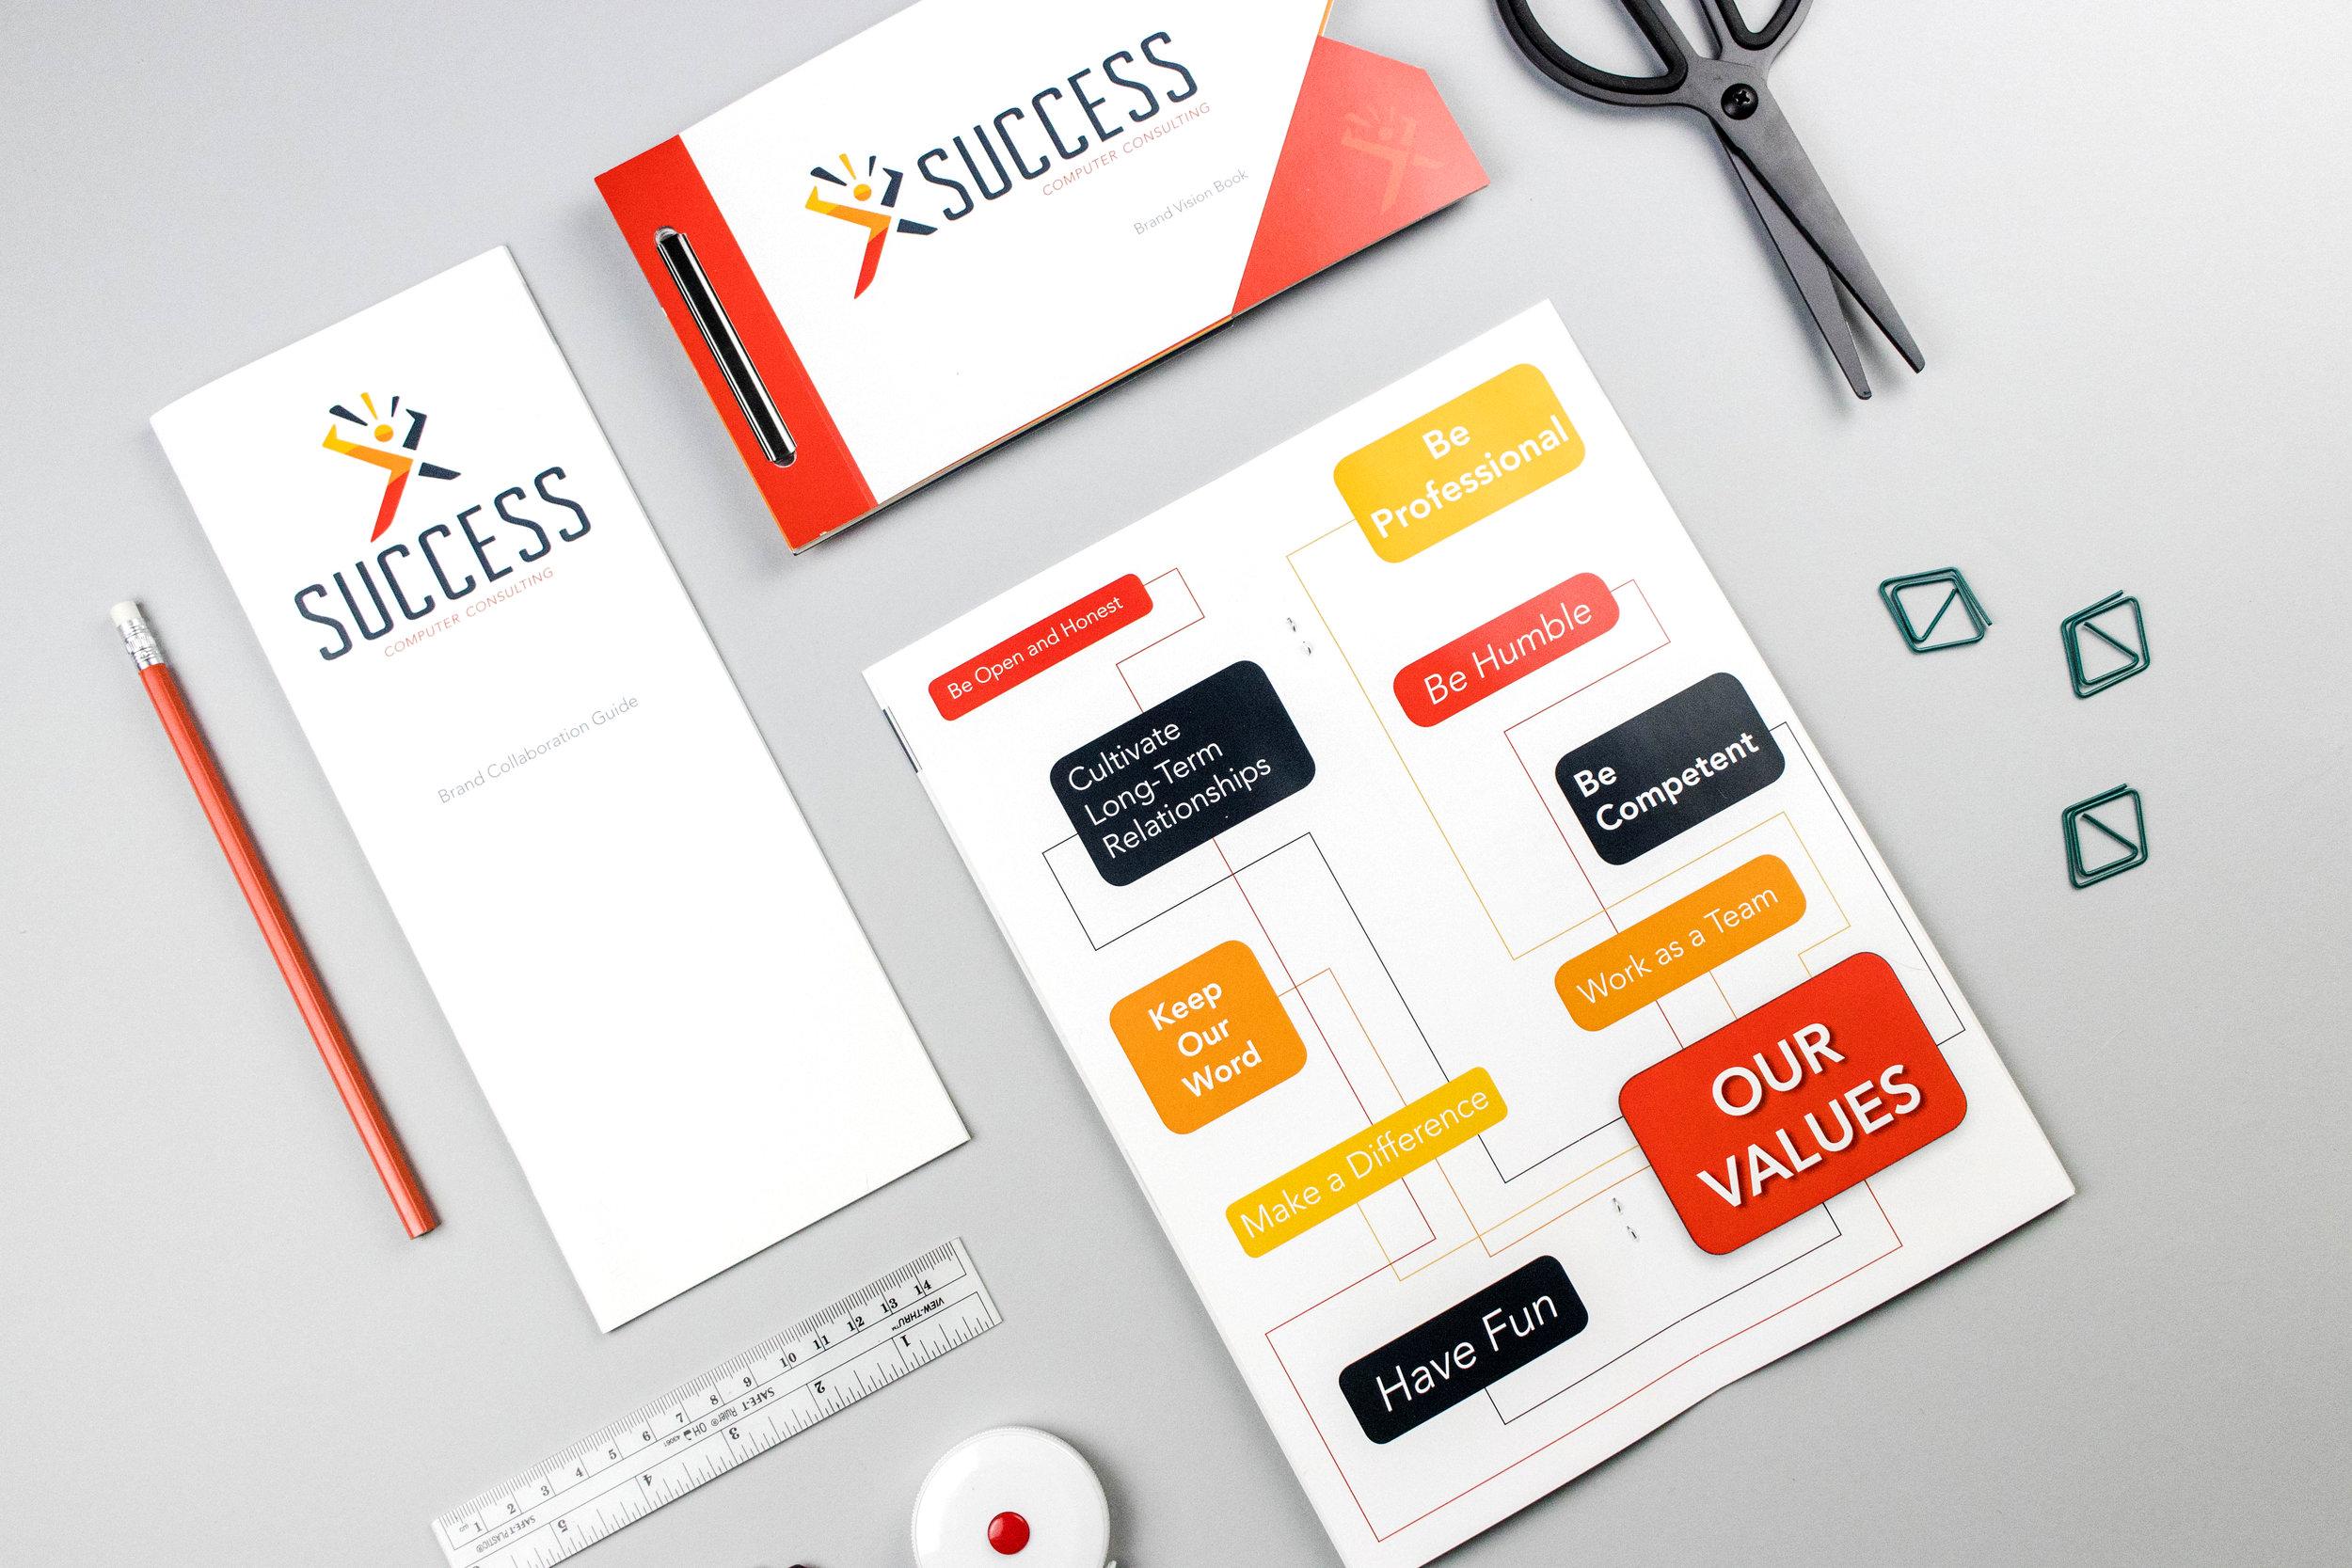 success_cover.jpg